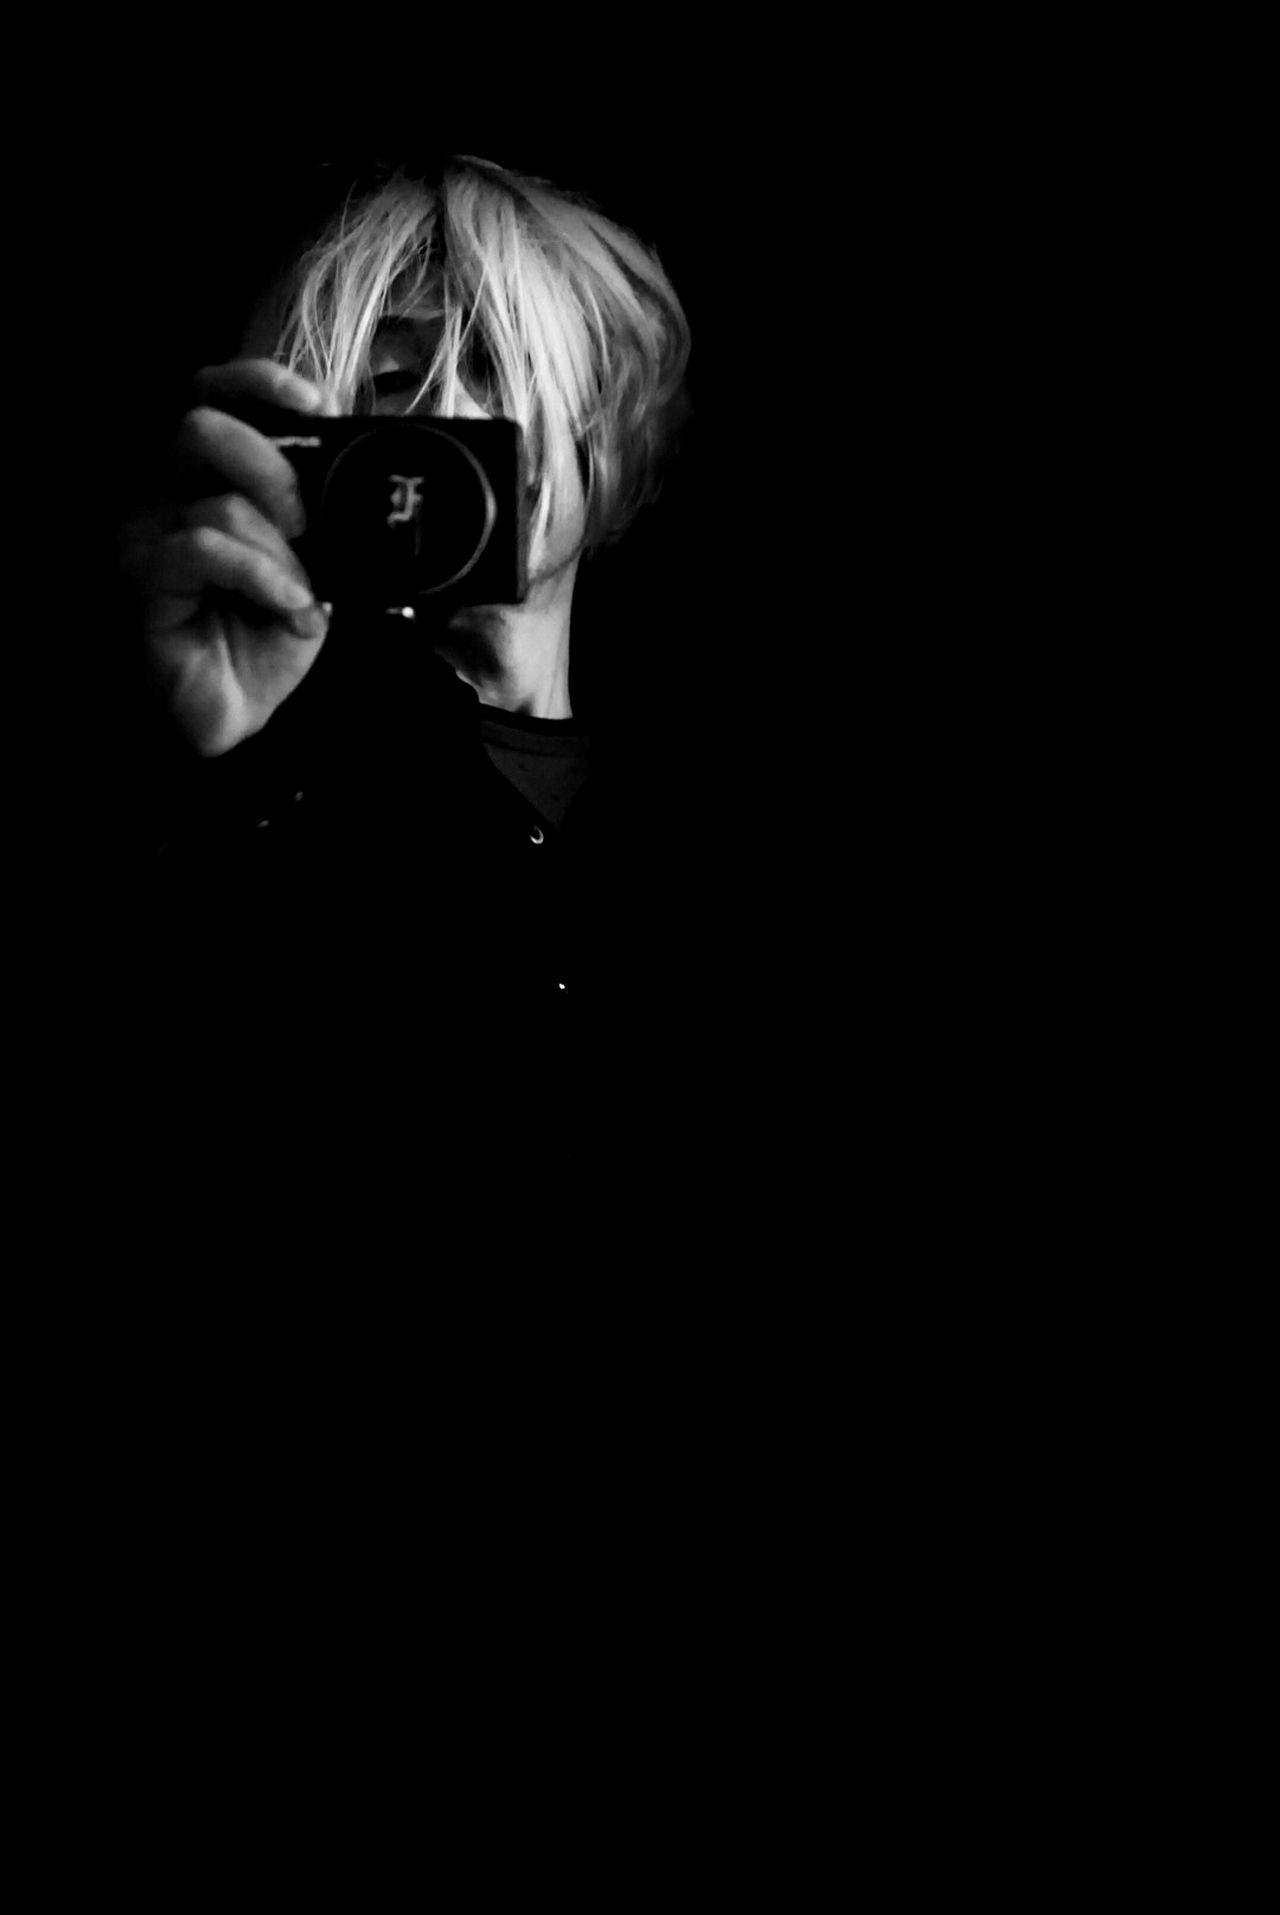 Sunday morning My Self Black Black & White B&w Photo Black And White Blackandwhite Selfie Portrait Black&white Monochrome B&W Collections EyeEm Best Shots - Black + White Black And White Collection  Self Portrait Around The World B&W_collection B&w Photography B&W Collection B&W Portrait Blackandwhite Photography Black And White Photography Black And White Portrait B&W Collective Blackandwhitephotography B&wphotography Olympus Pen E-P6